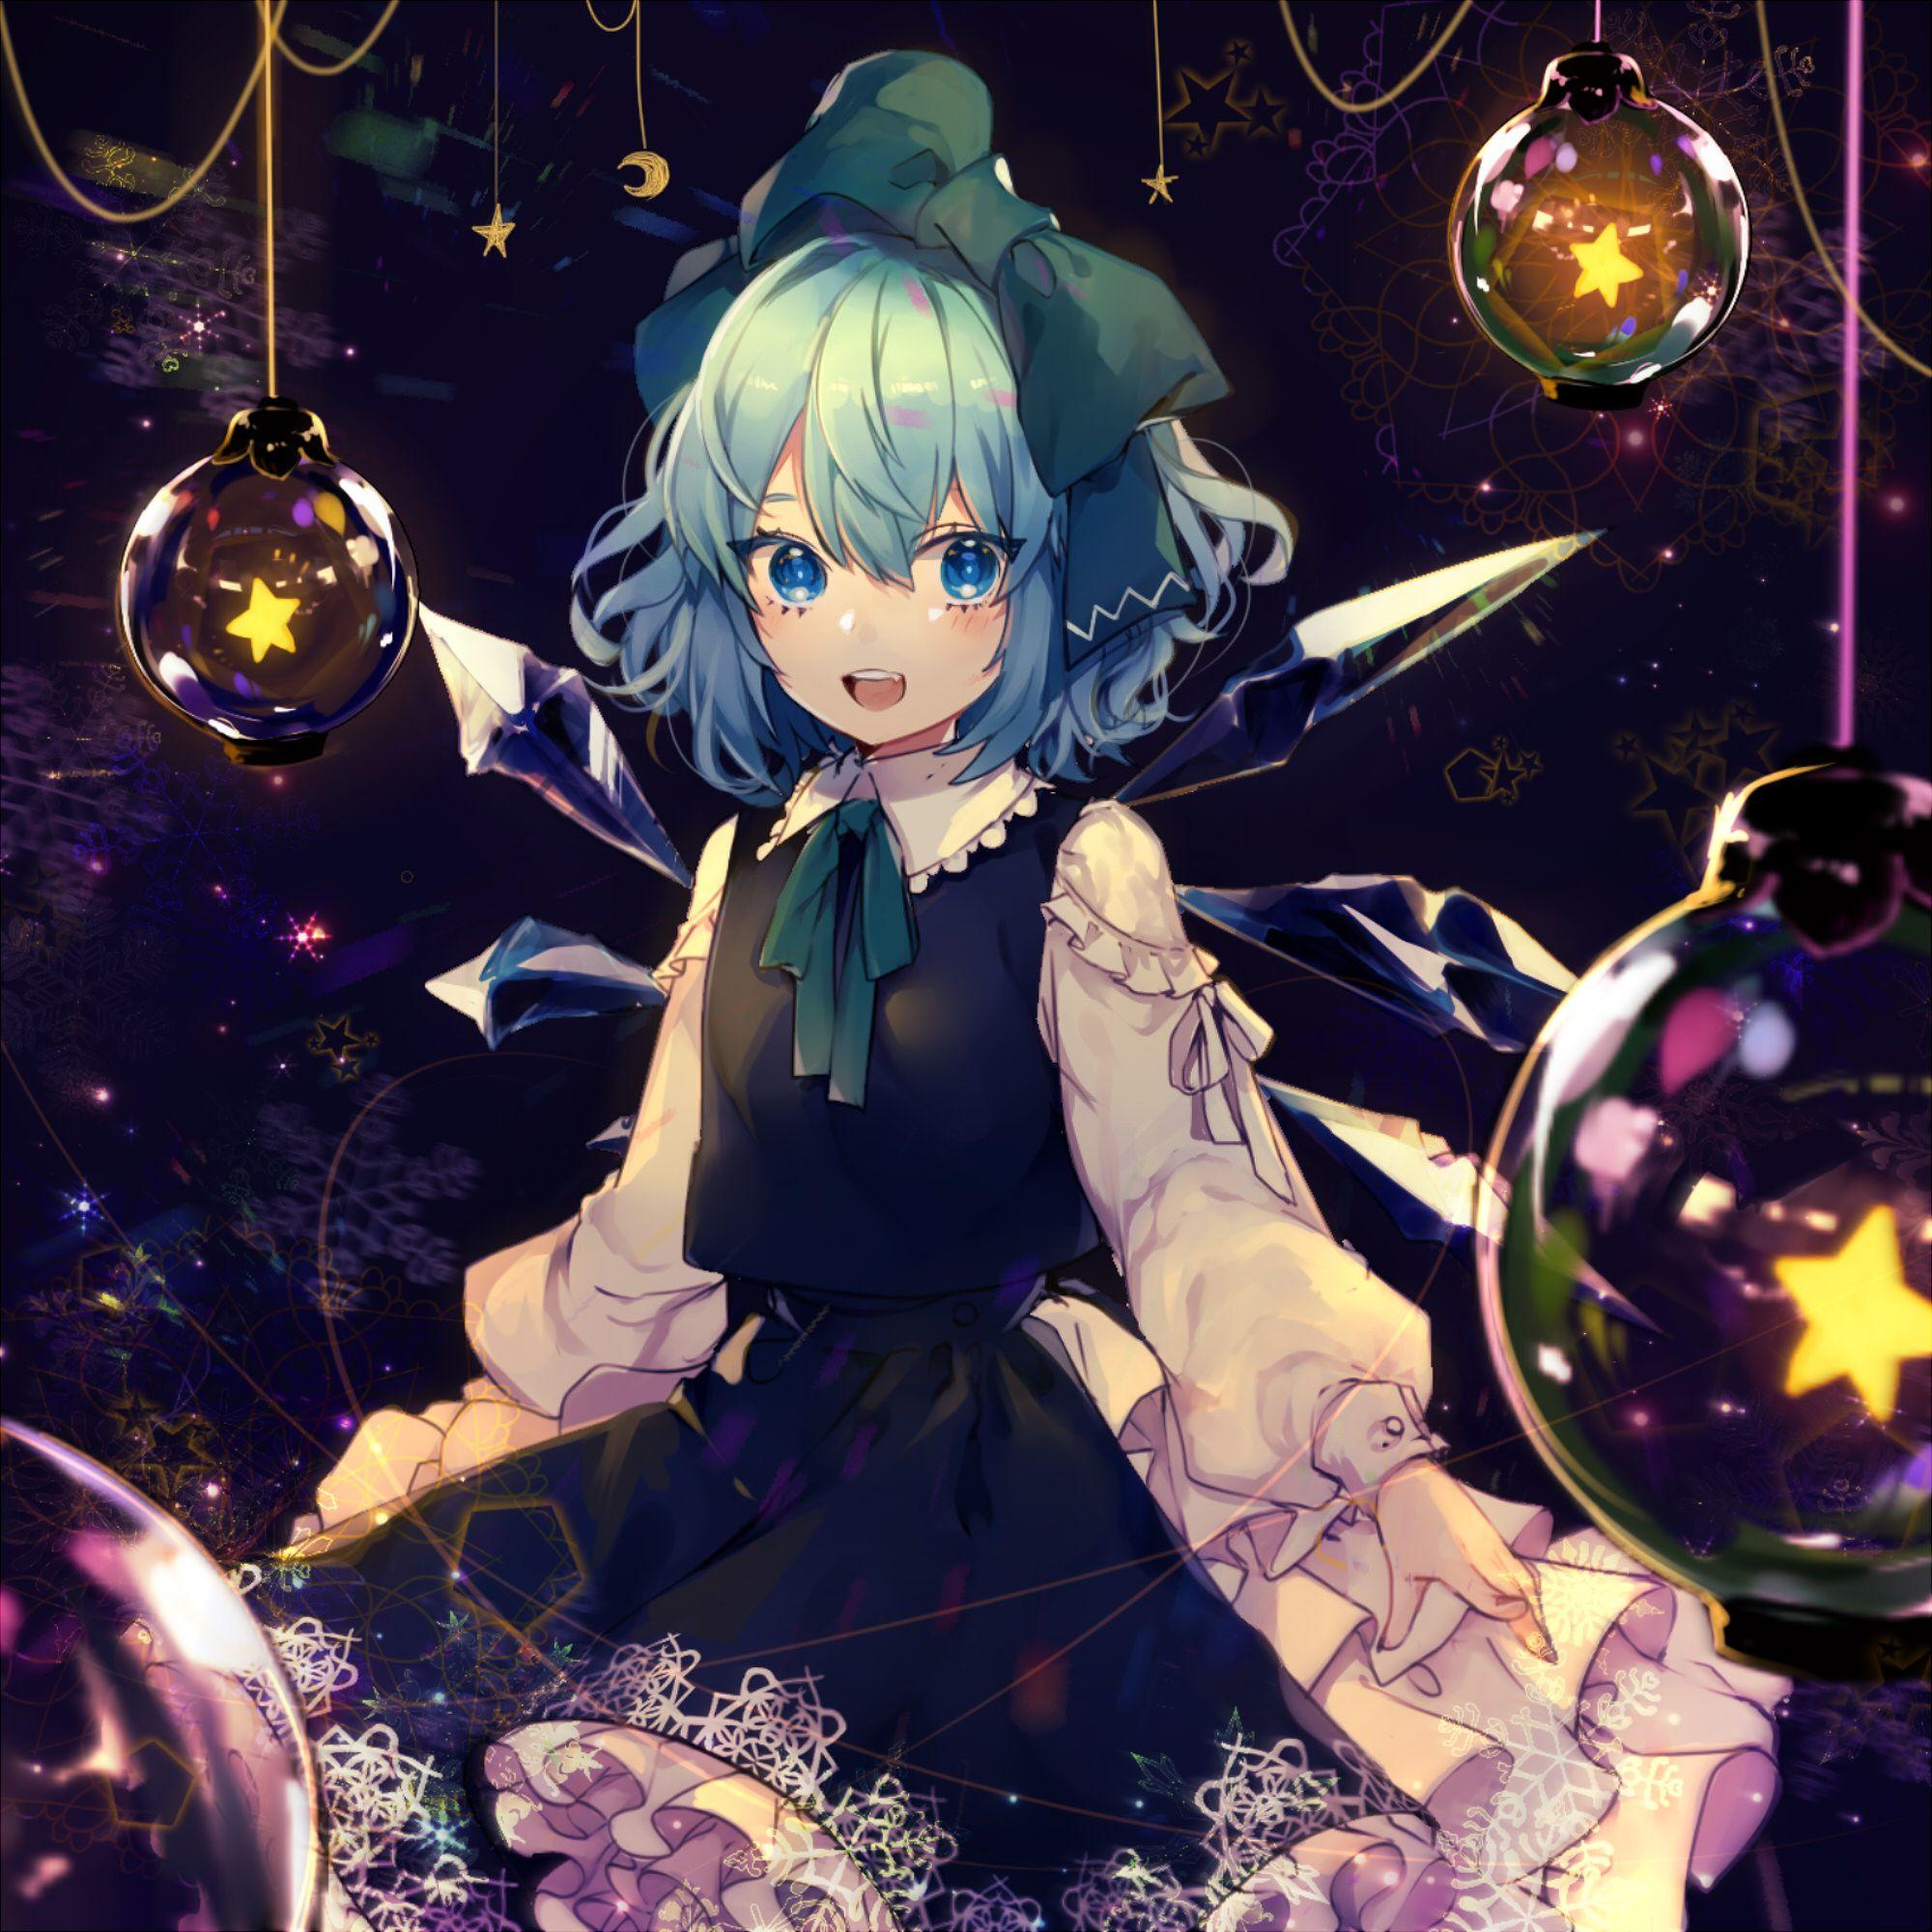 winter magic [i 66078530] [2000x2000] pixiv Anime, Art